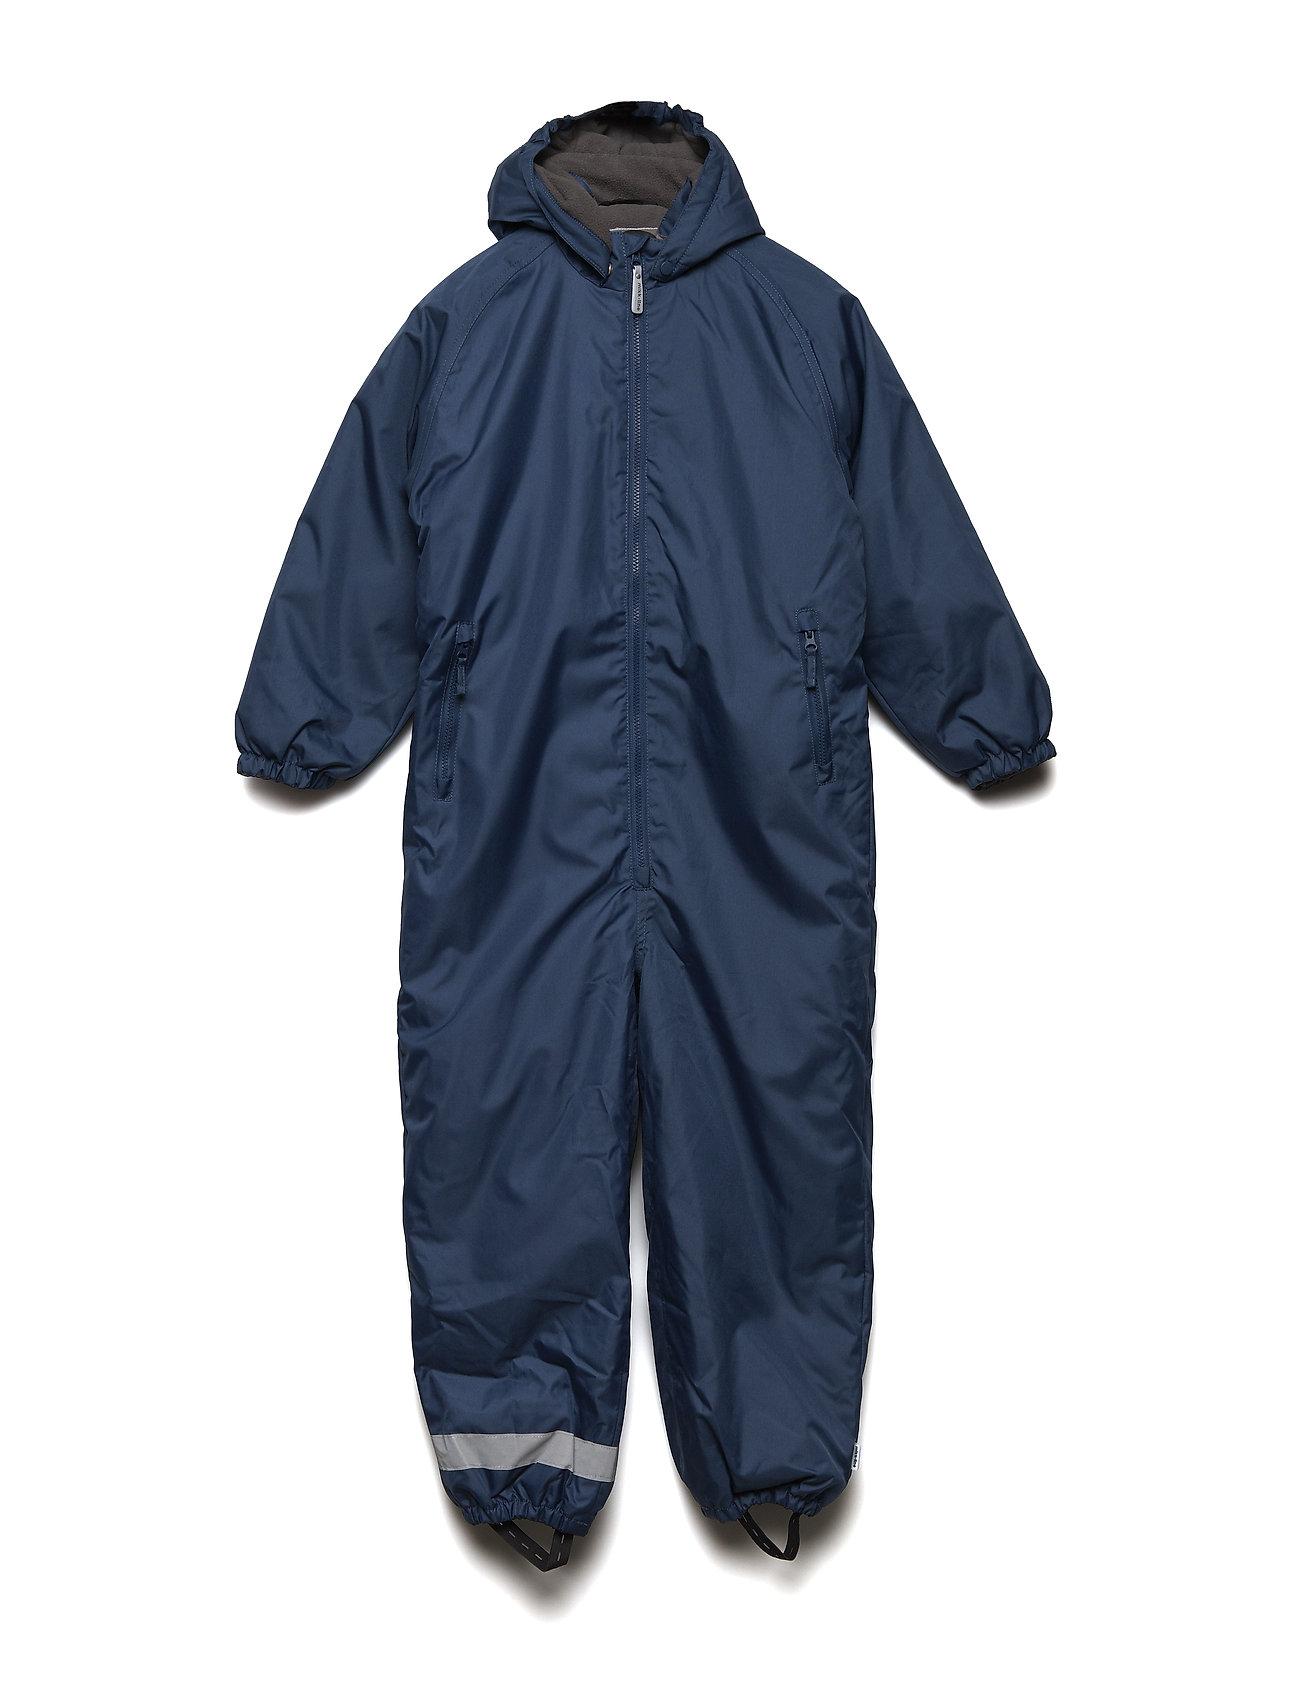 Mikk-Line WINTER suit